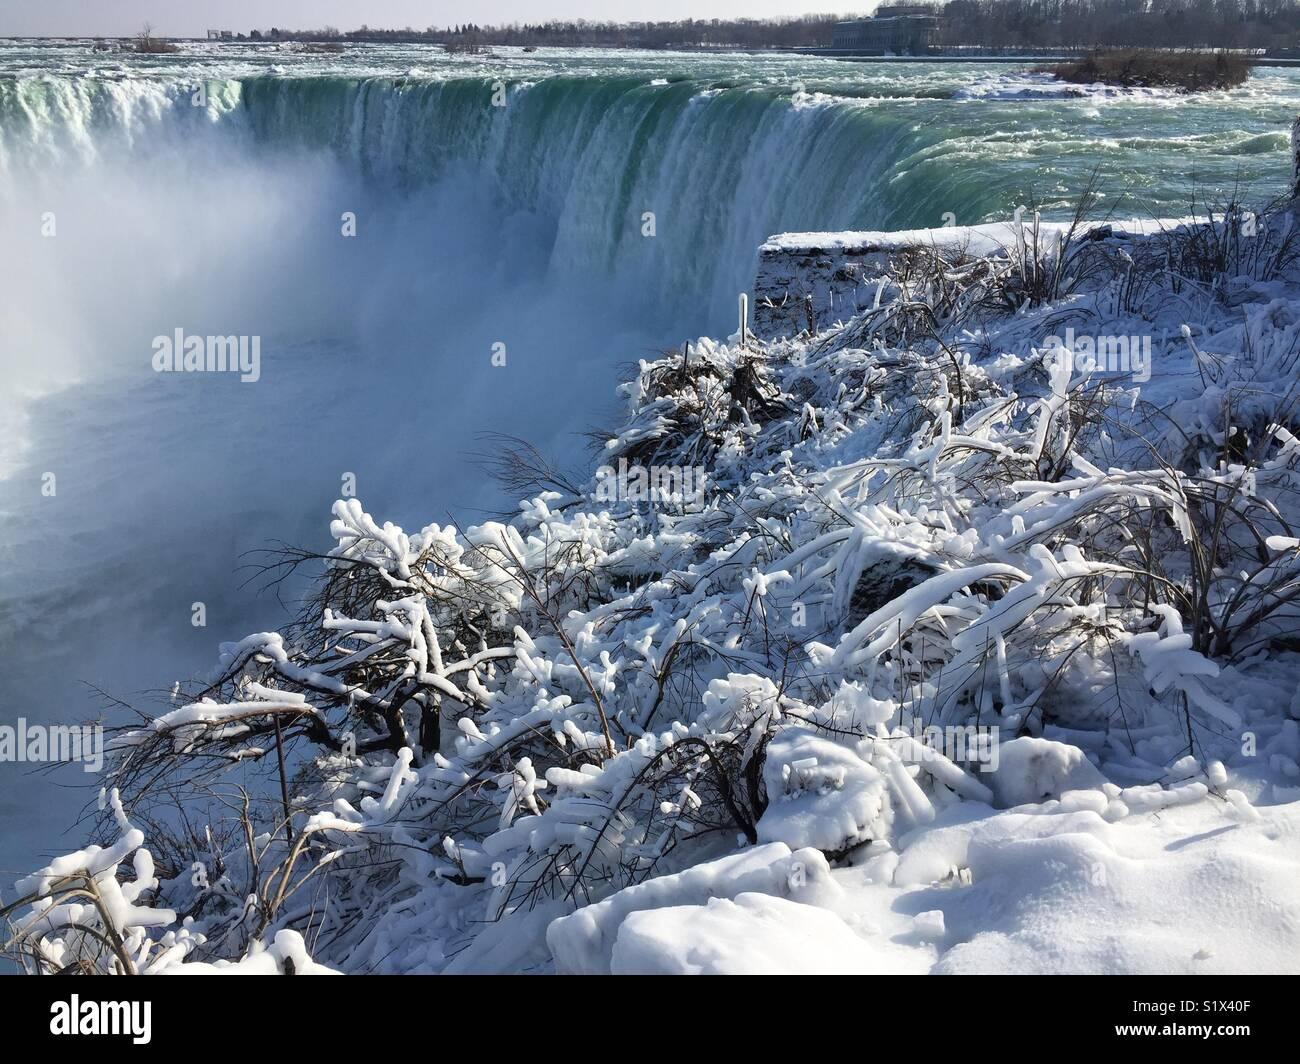 Freezing weather in Niagara Falls - Stock Image